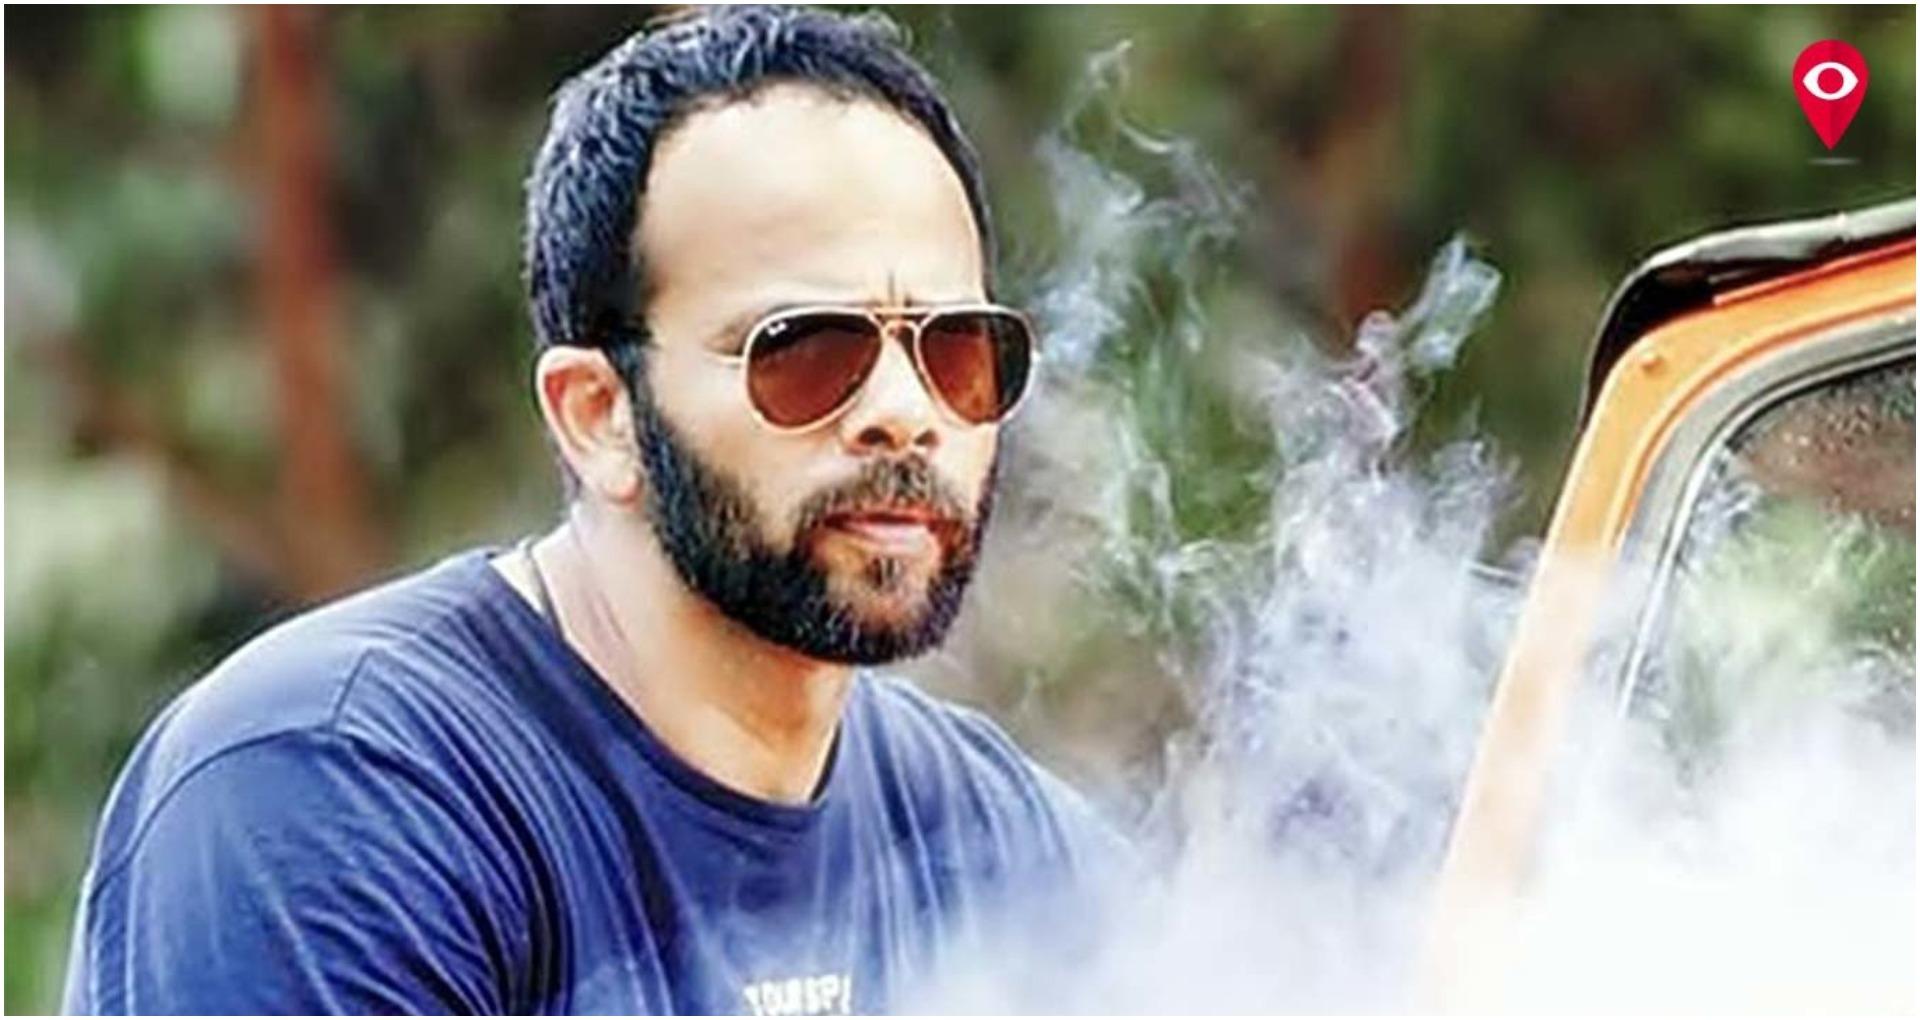 अक्षय कुमार की 'सूर्यवंशी' तमिल फिल्म की रीमेक है? फिल्ममेकर रोहित शेट्टी ने बताई असली सच्चाई